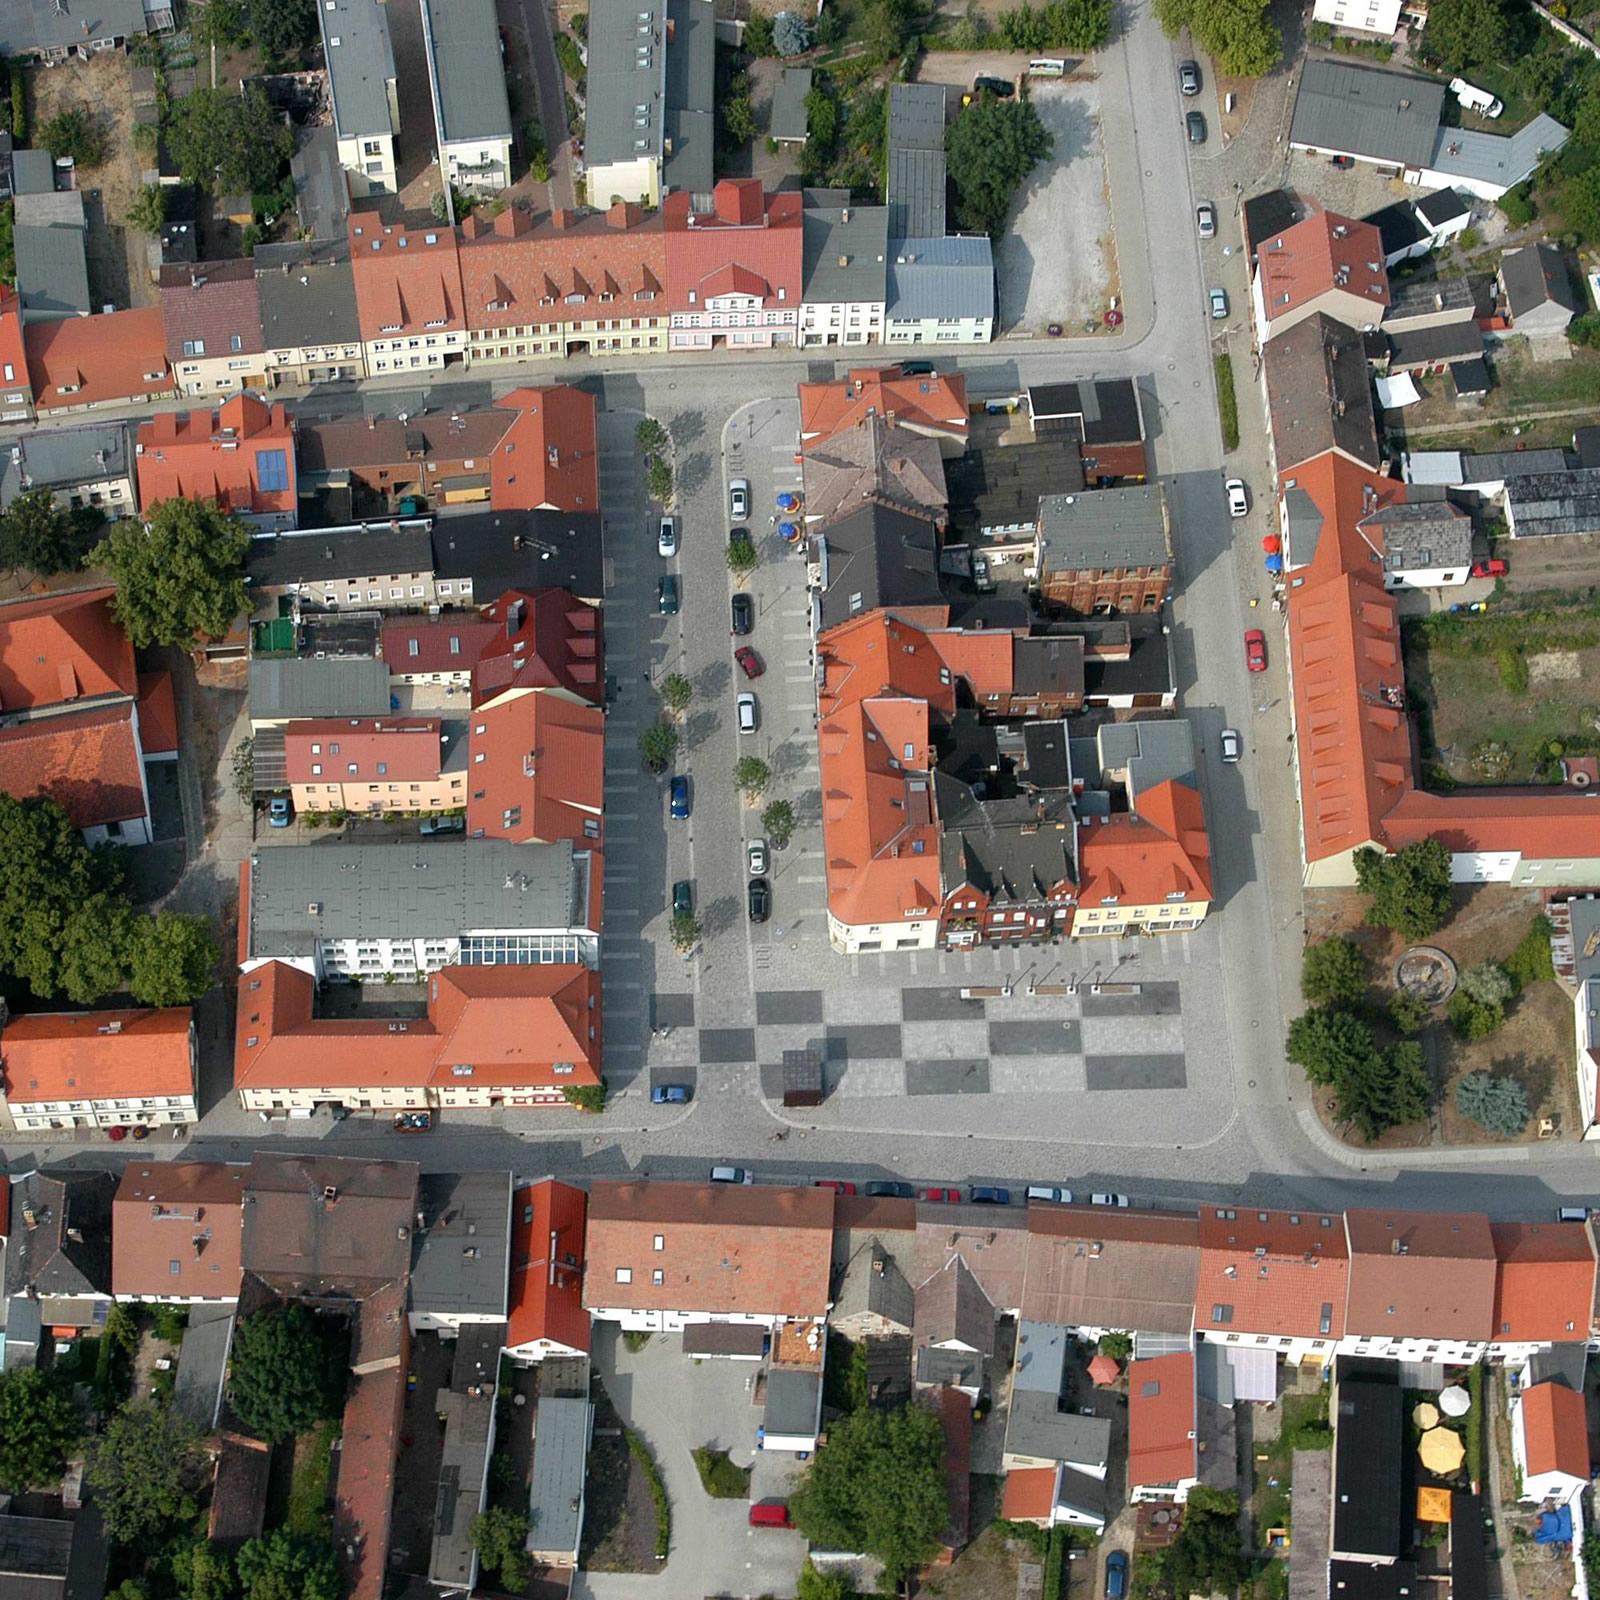 Neugestaltung Marktplatz Vetschau / Spreewald